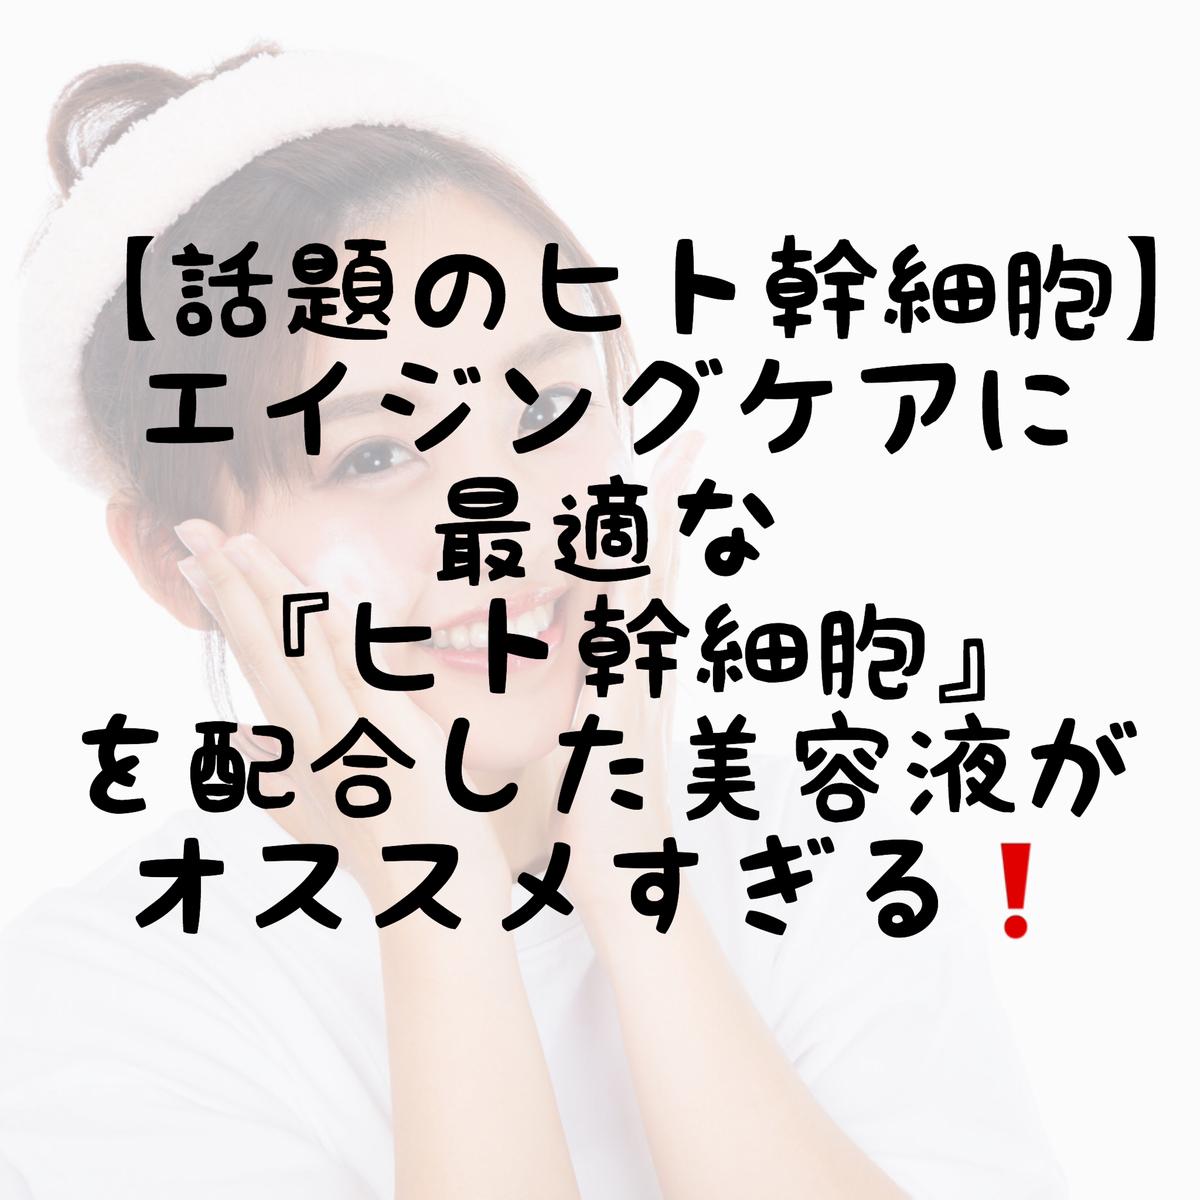 f:id:nokonoko_o:20200616173223j:plain